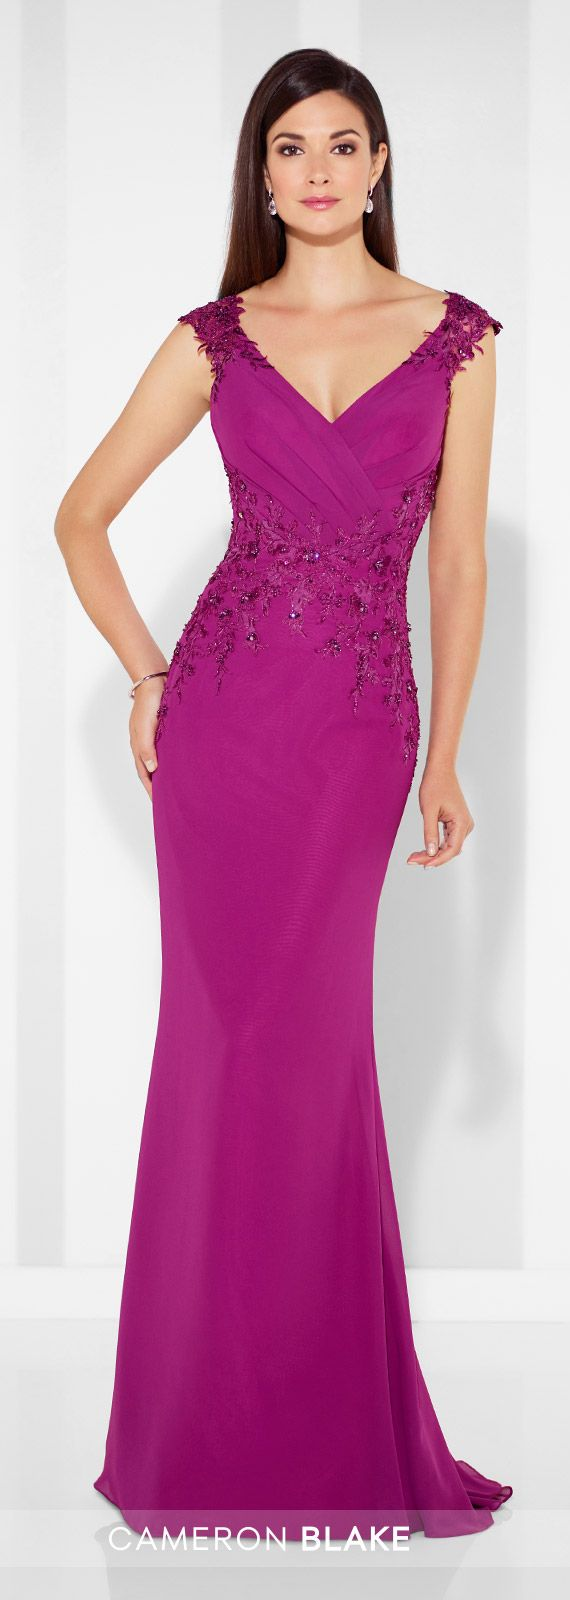 Cameron Blake - Evening Dresses - 117616 | Vestiditos, Vestidos de ...